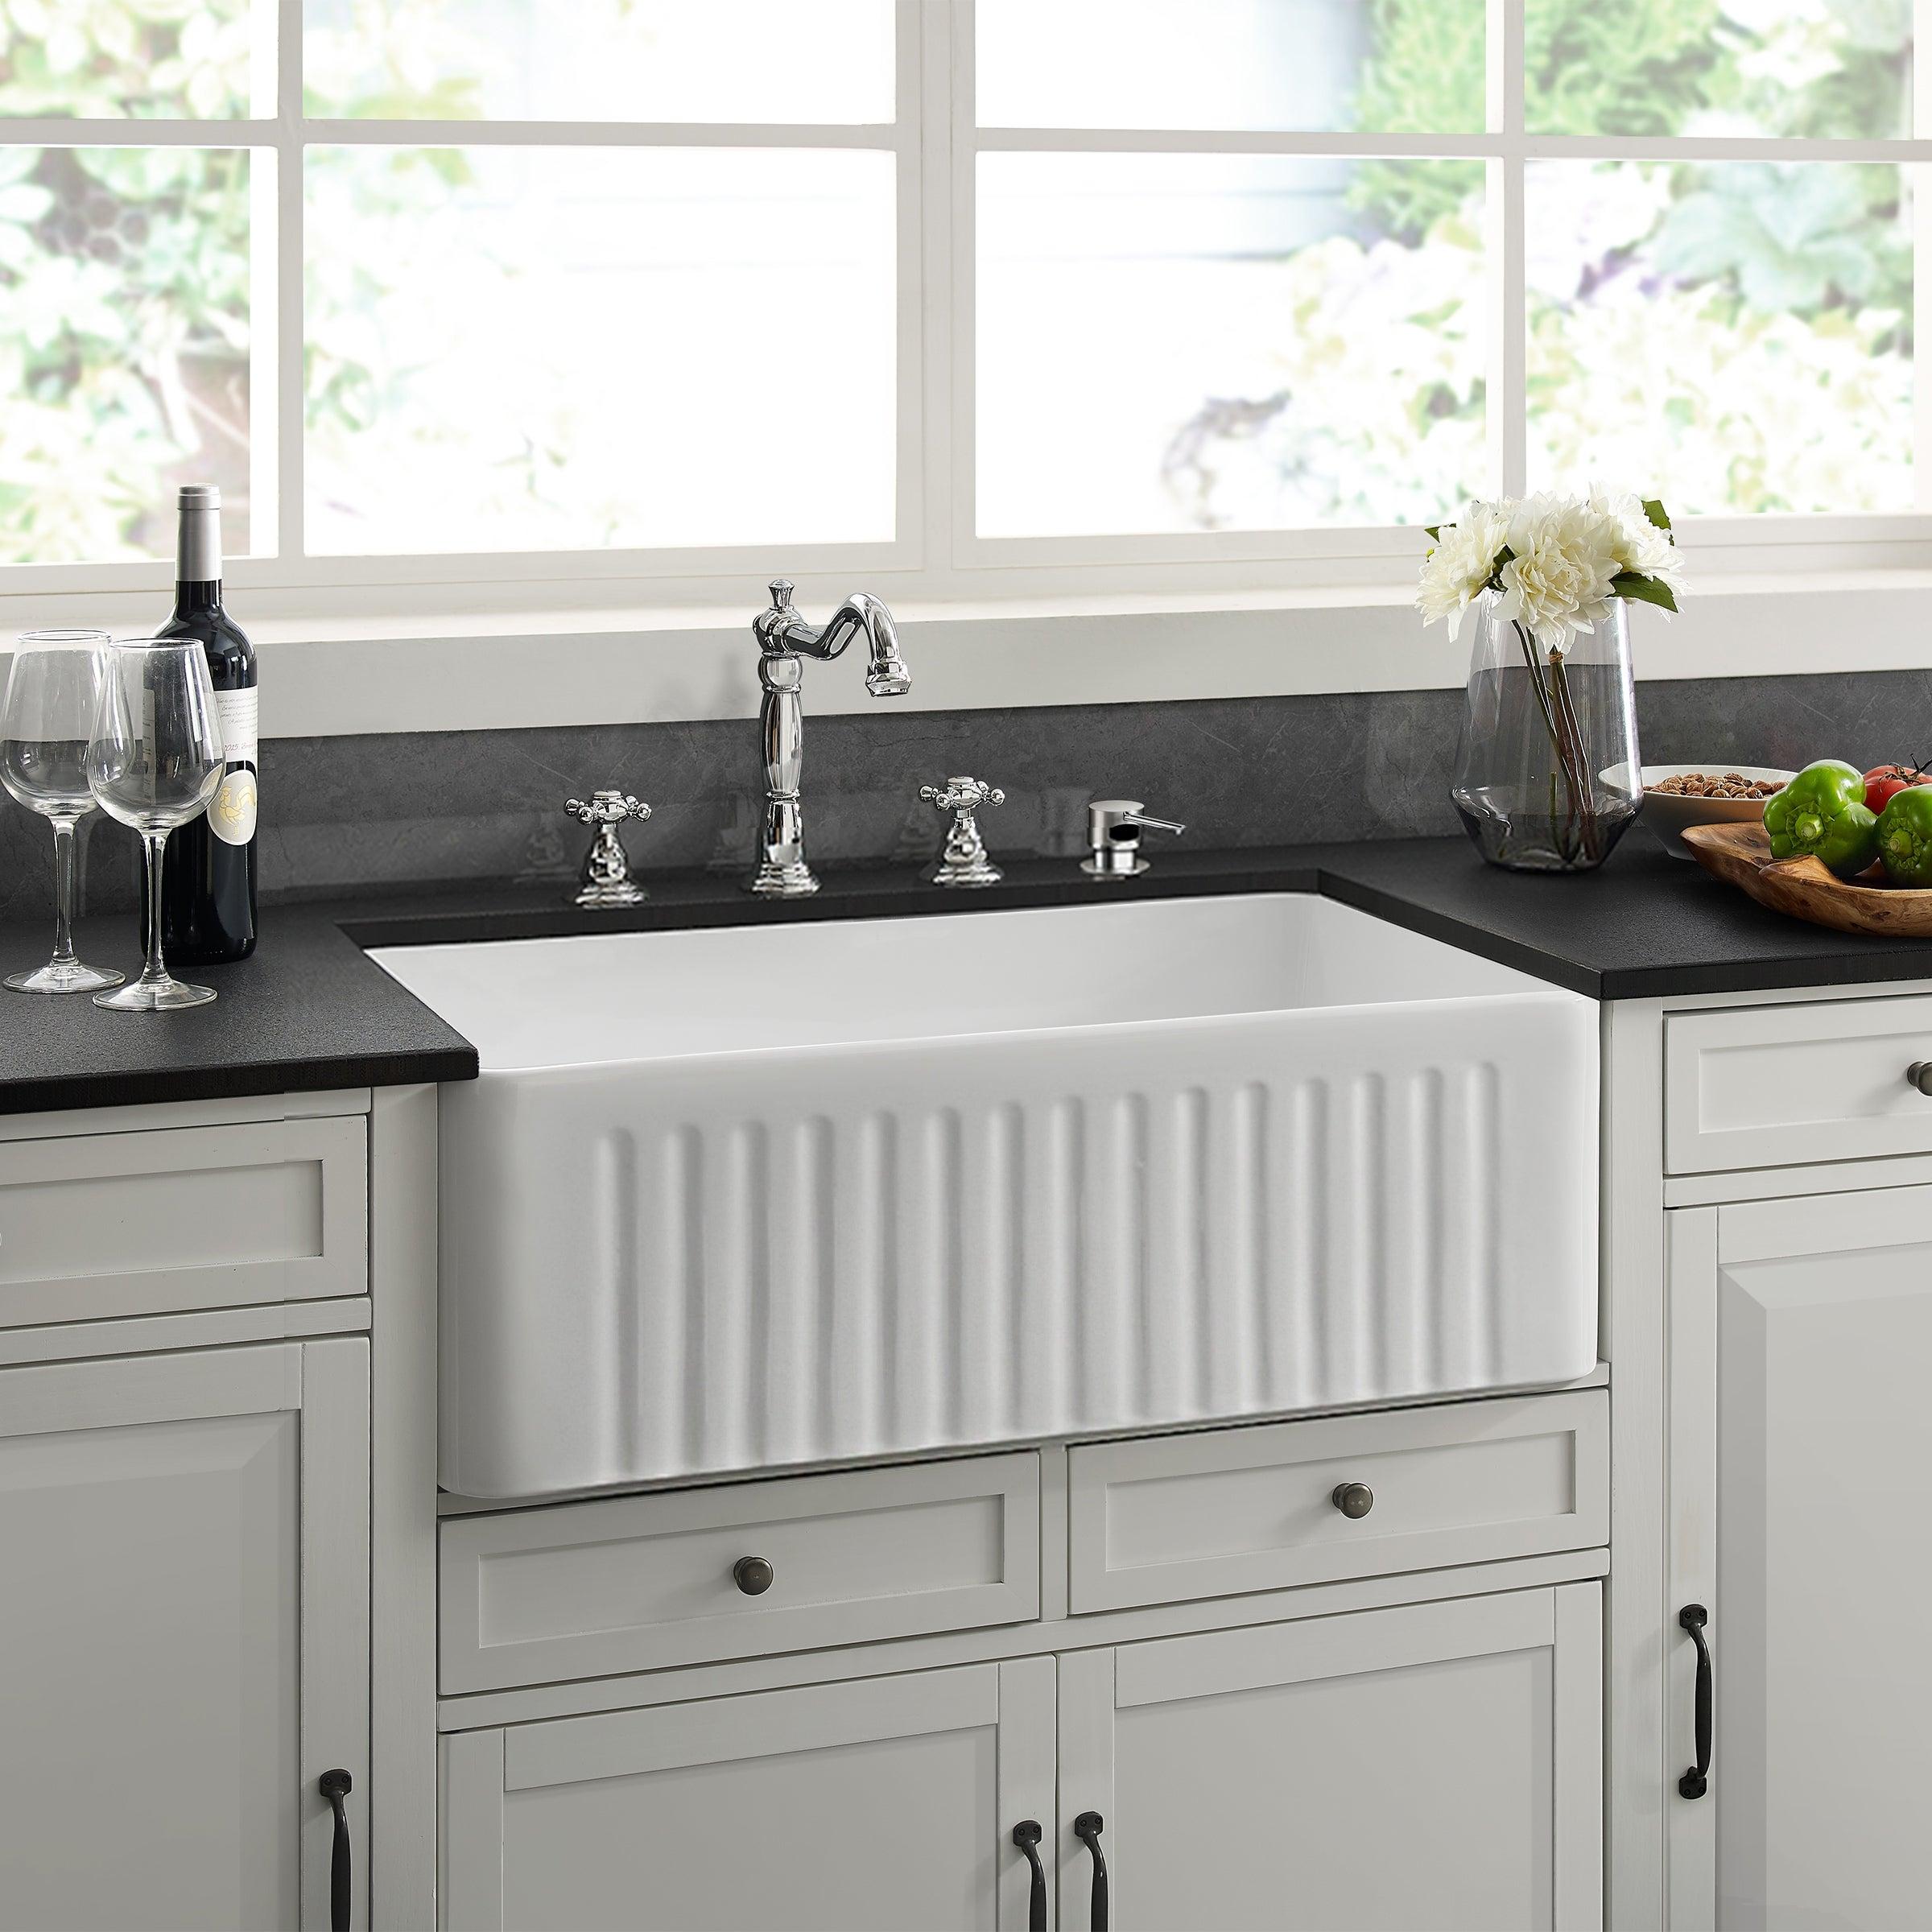 Delice 30 X 18 Ceramic Farmhouse Kitchen Sink 30 X 18 Overstock 26440099